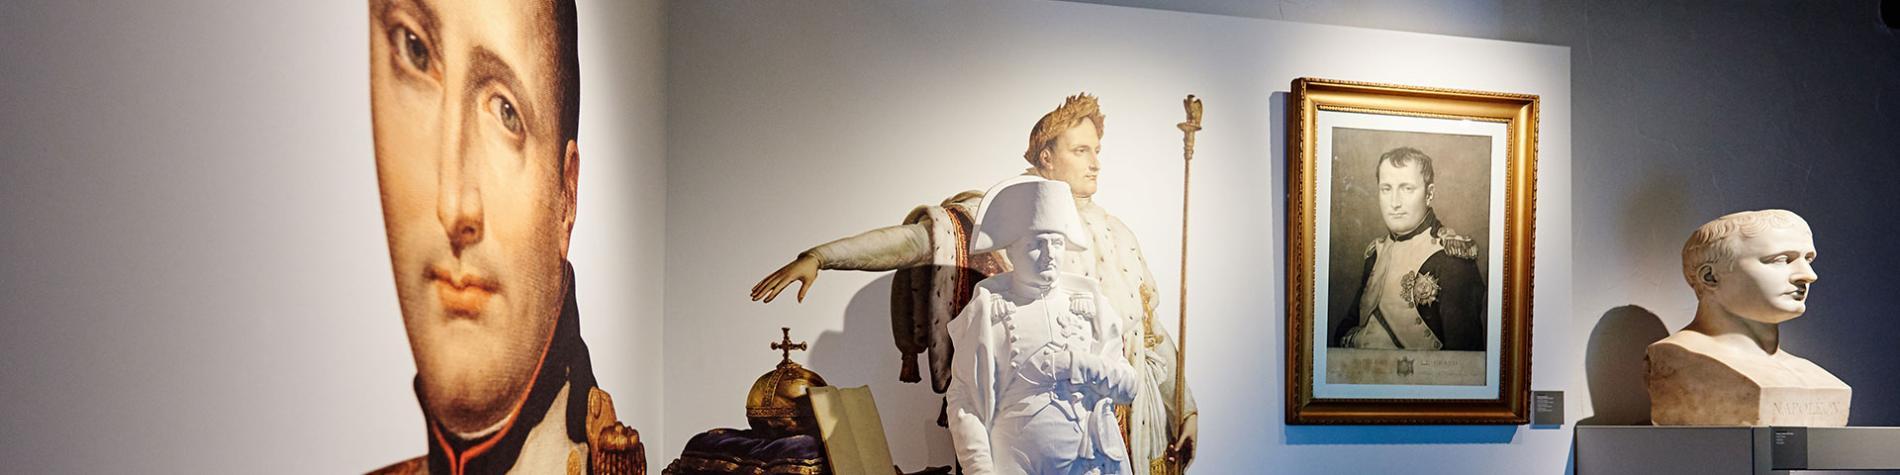 Napoleon - Last HQ